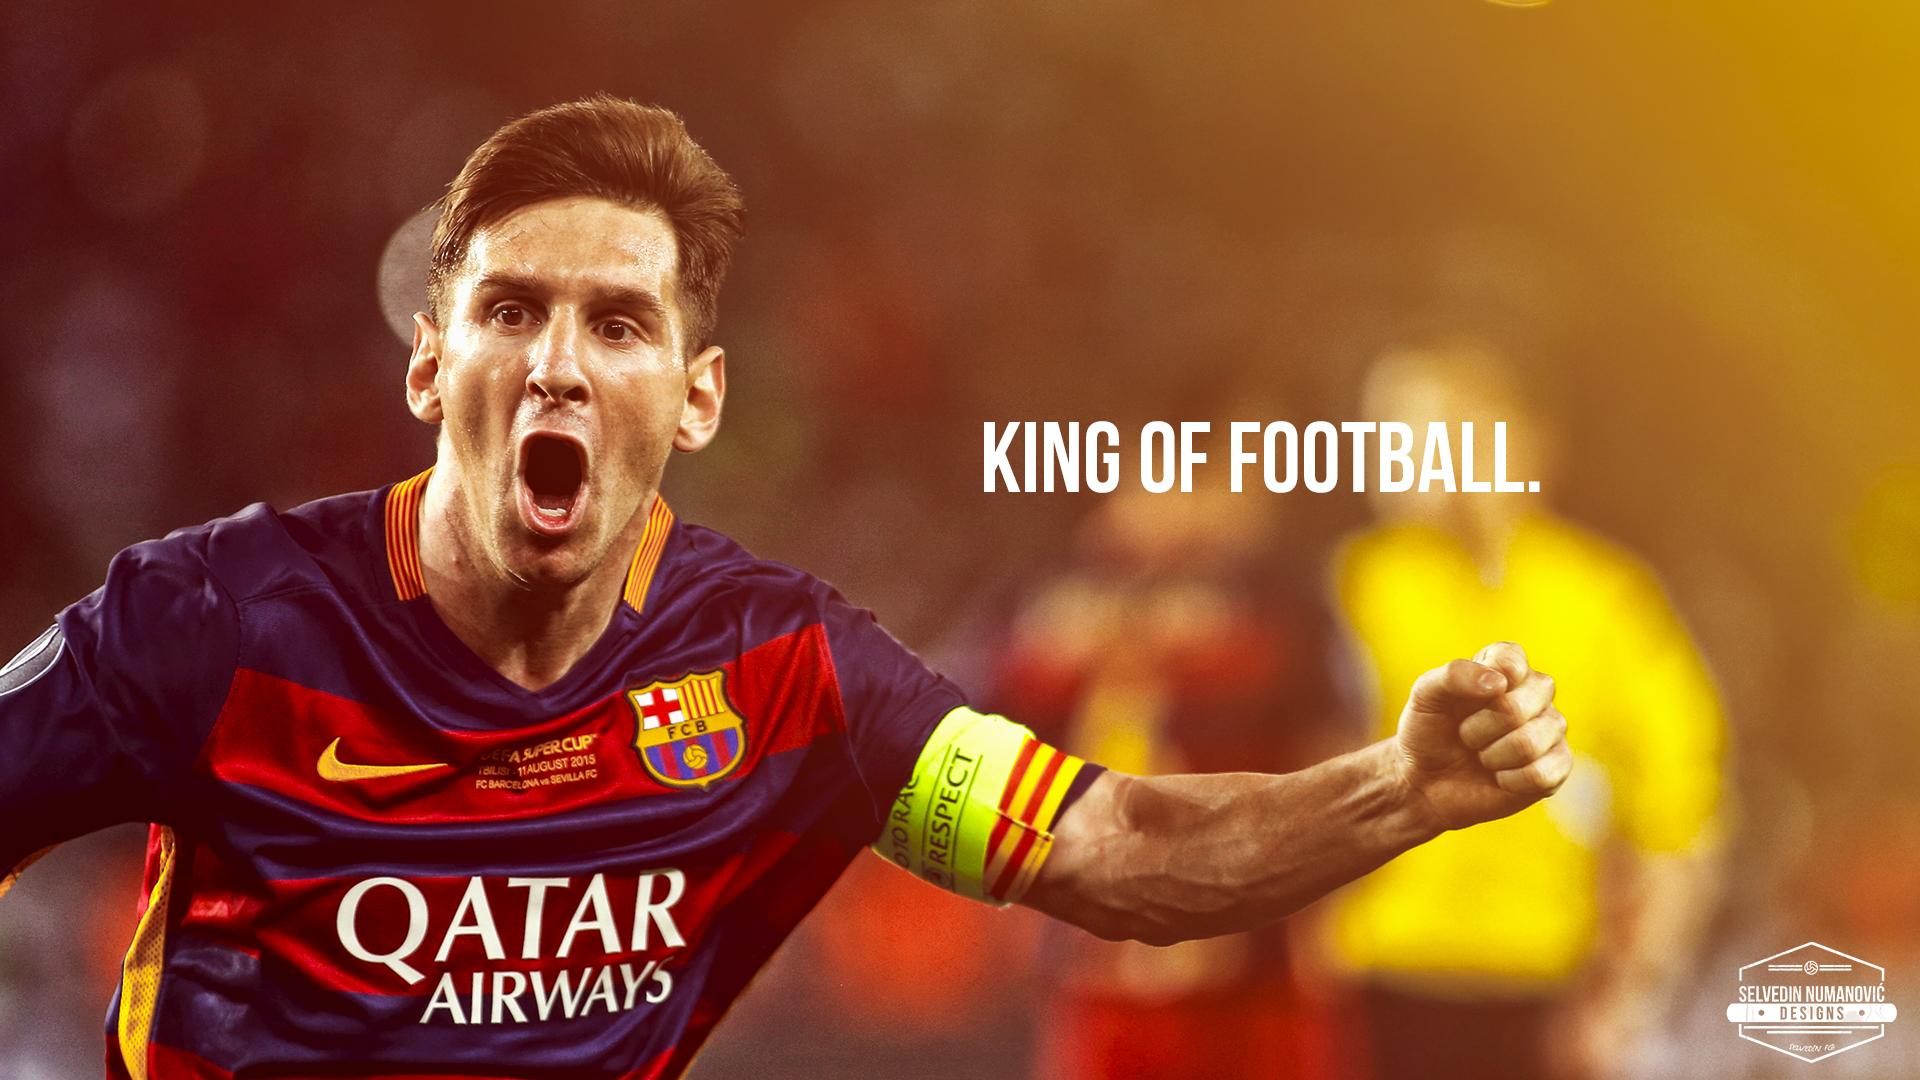 Lionel Messi WALLPAPER 2015 By SelvedinFCB On DeviantArt